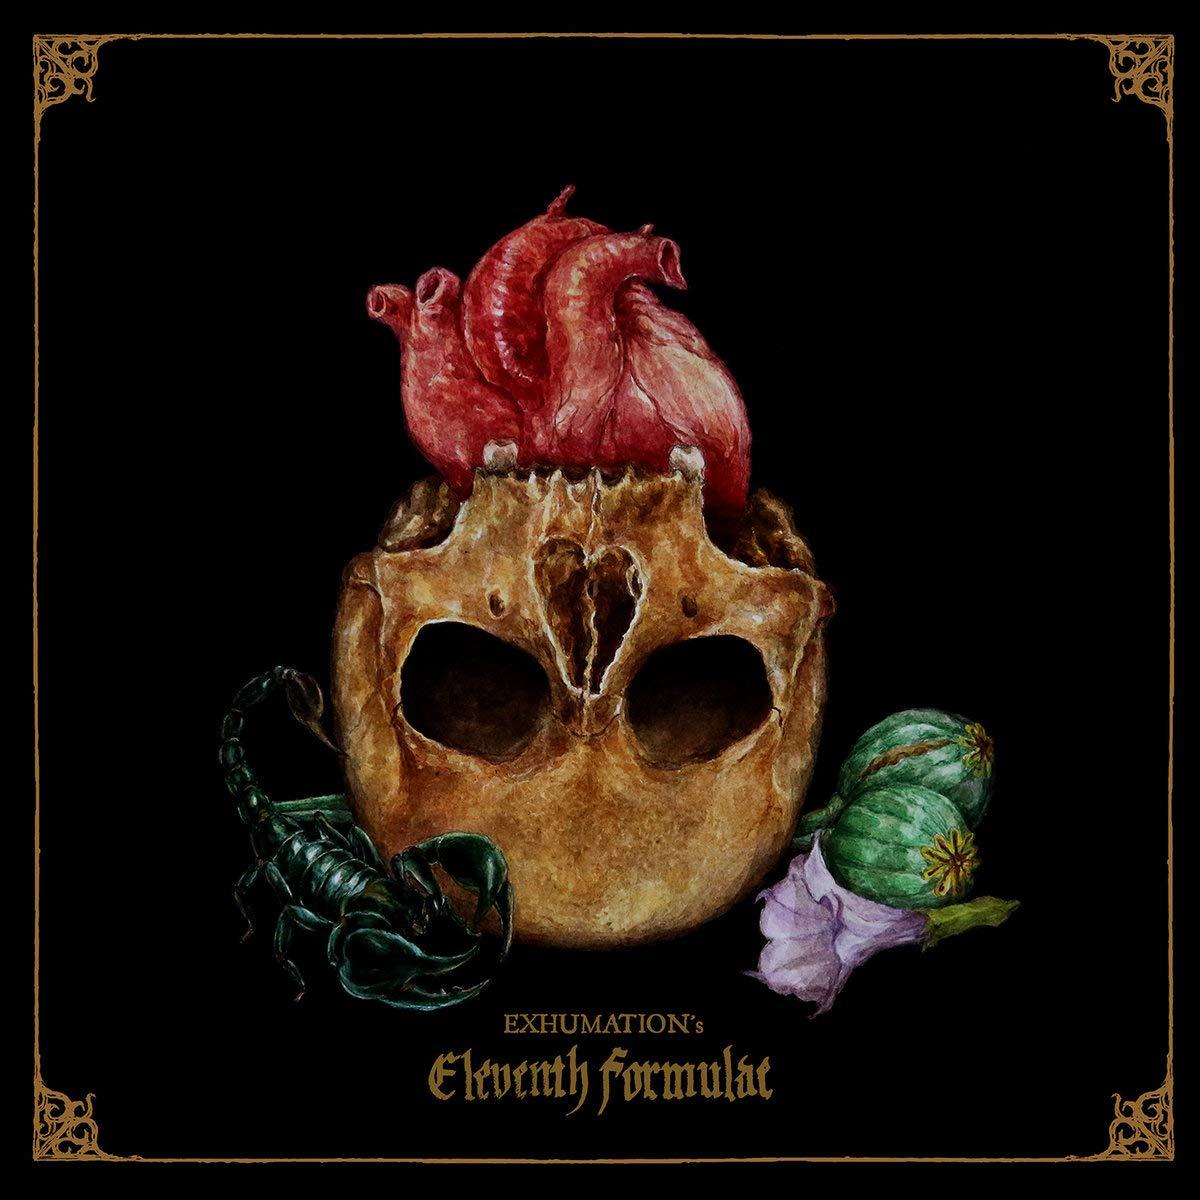 EXHUMATION (INDONESIA) - ELEVENTH FORMULAE (CD)